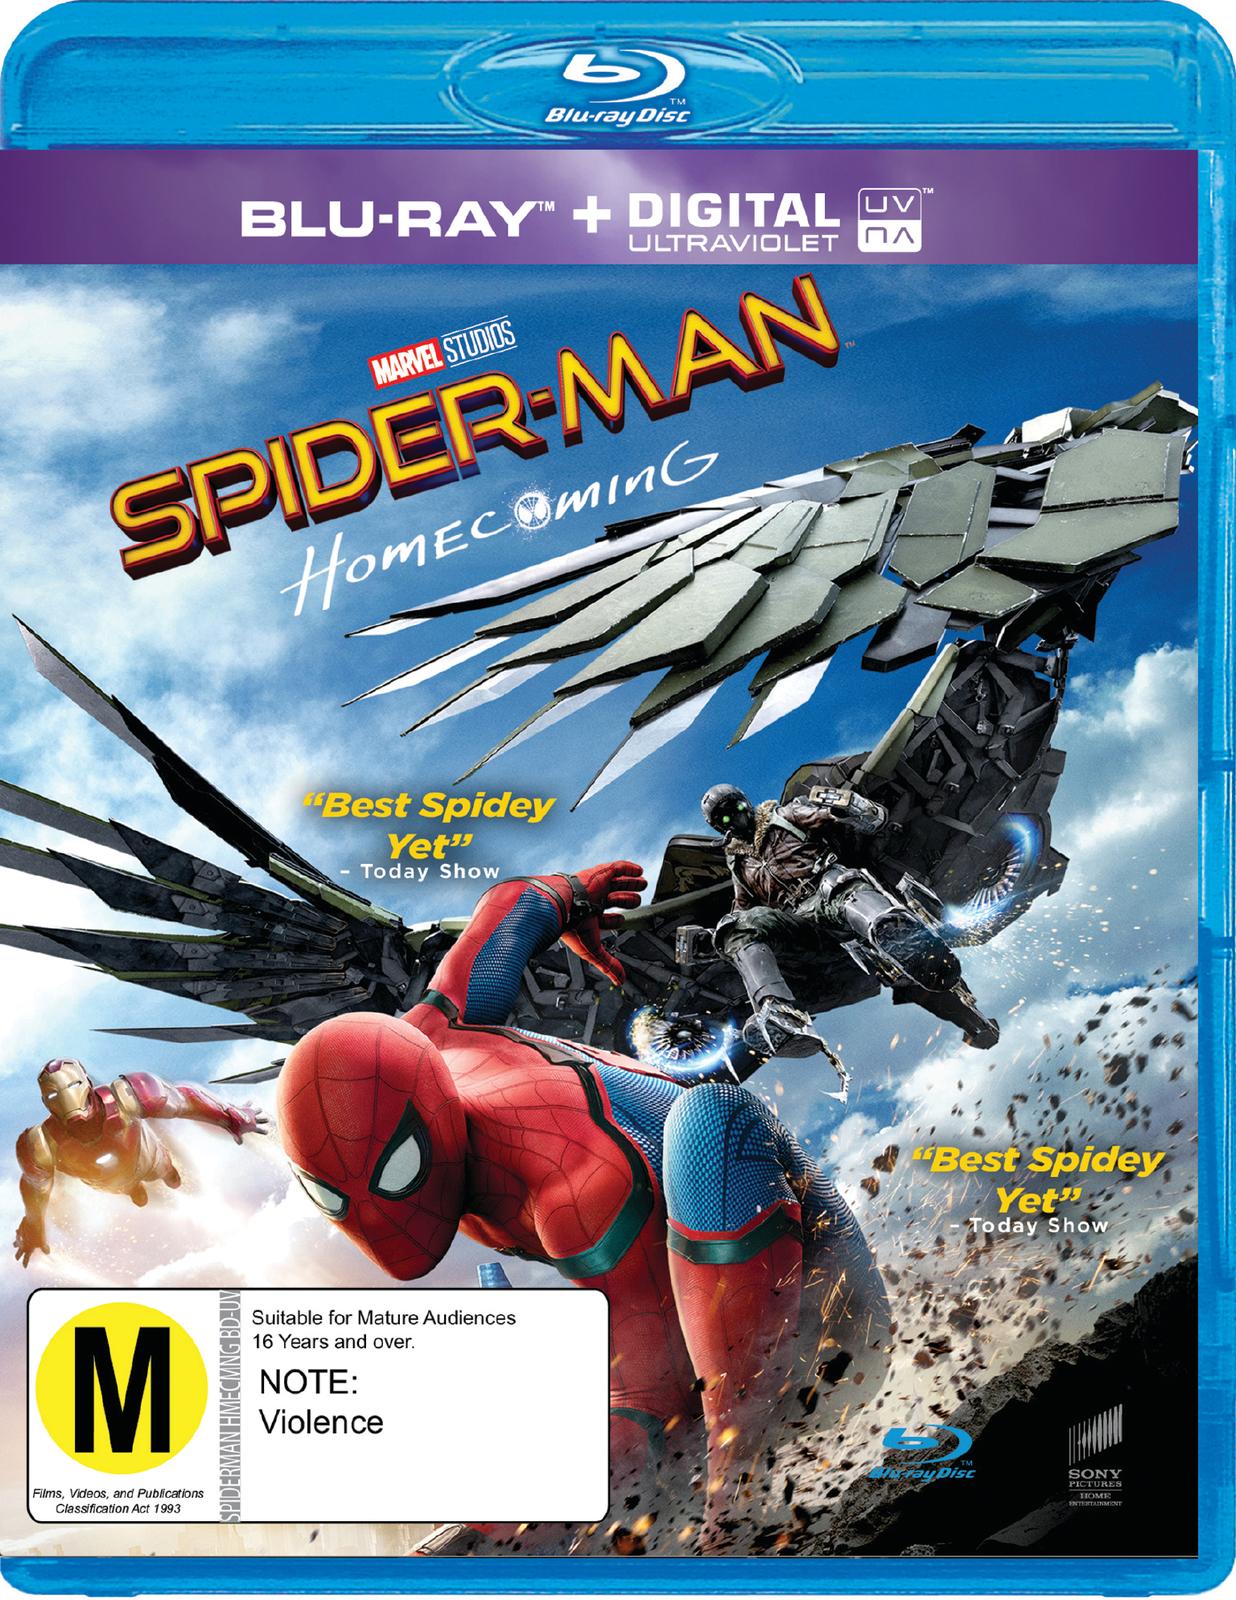 Spider-Man: Homecoming on Blu-ray, UV image